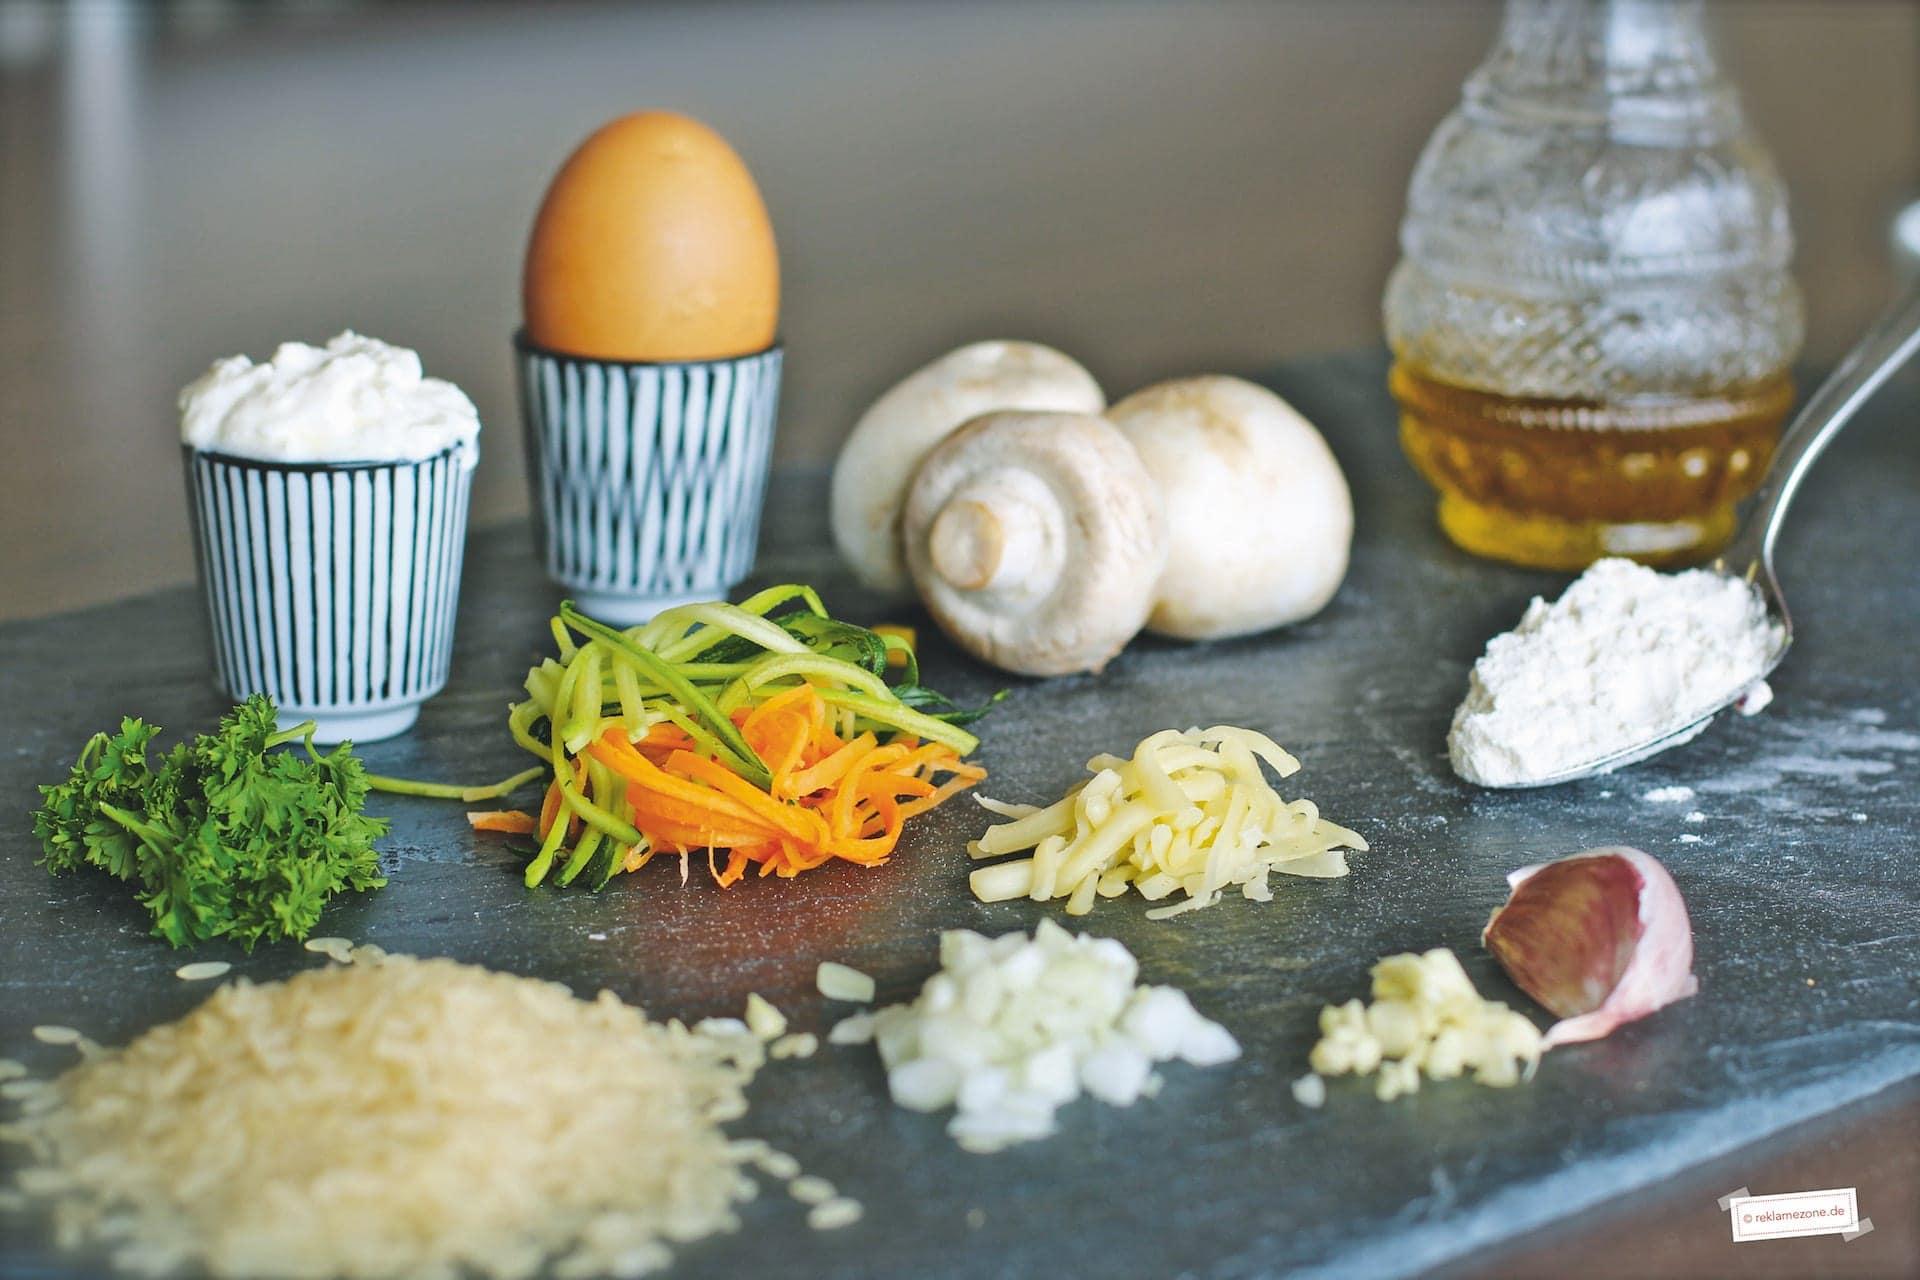 Reisgerichte, Reisfrikadellen - Foto: reklamezone.de